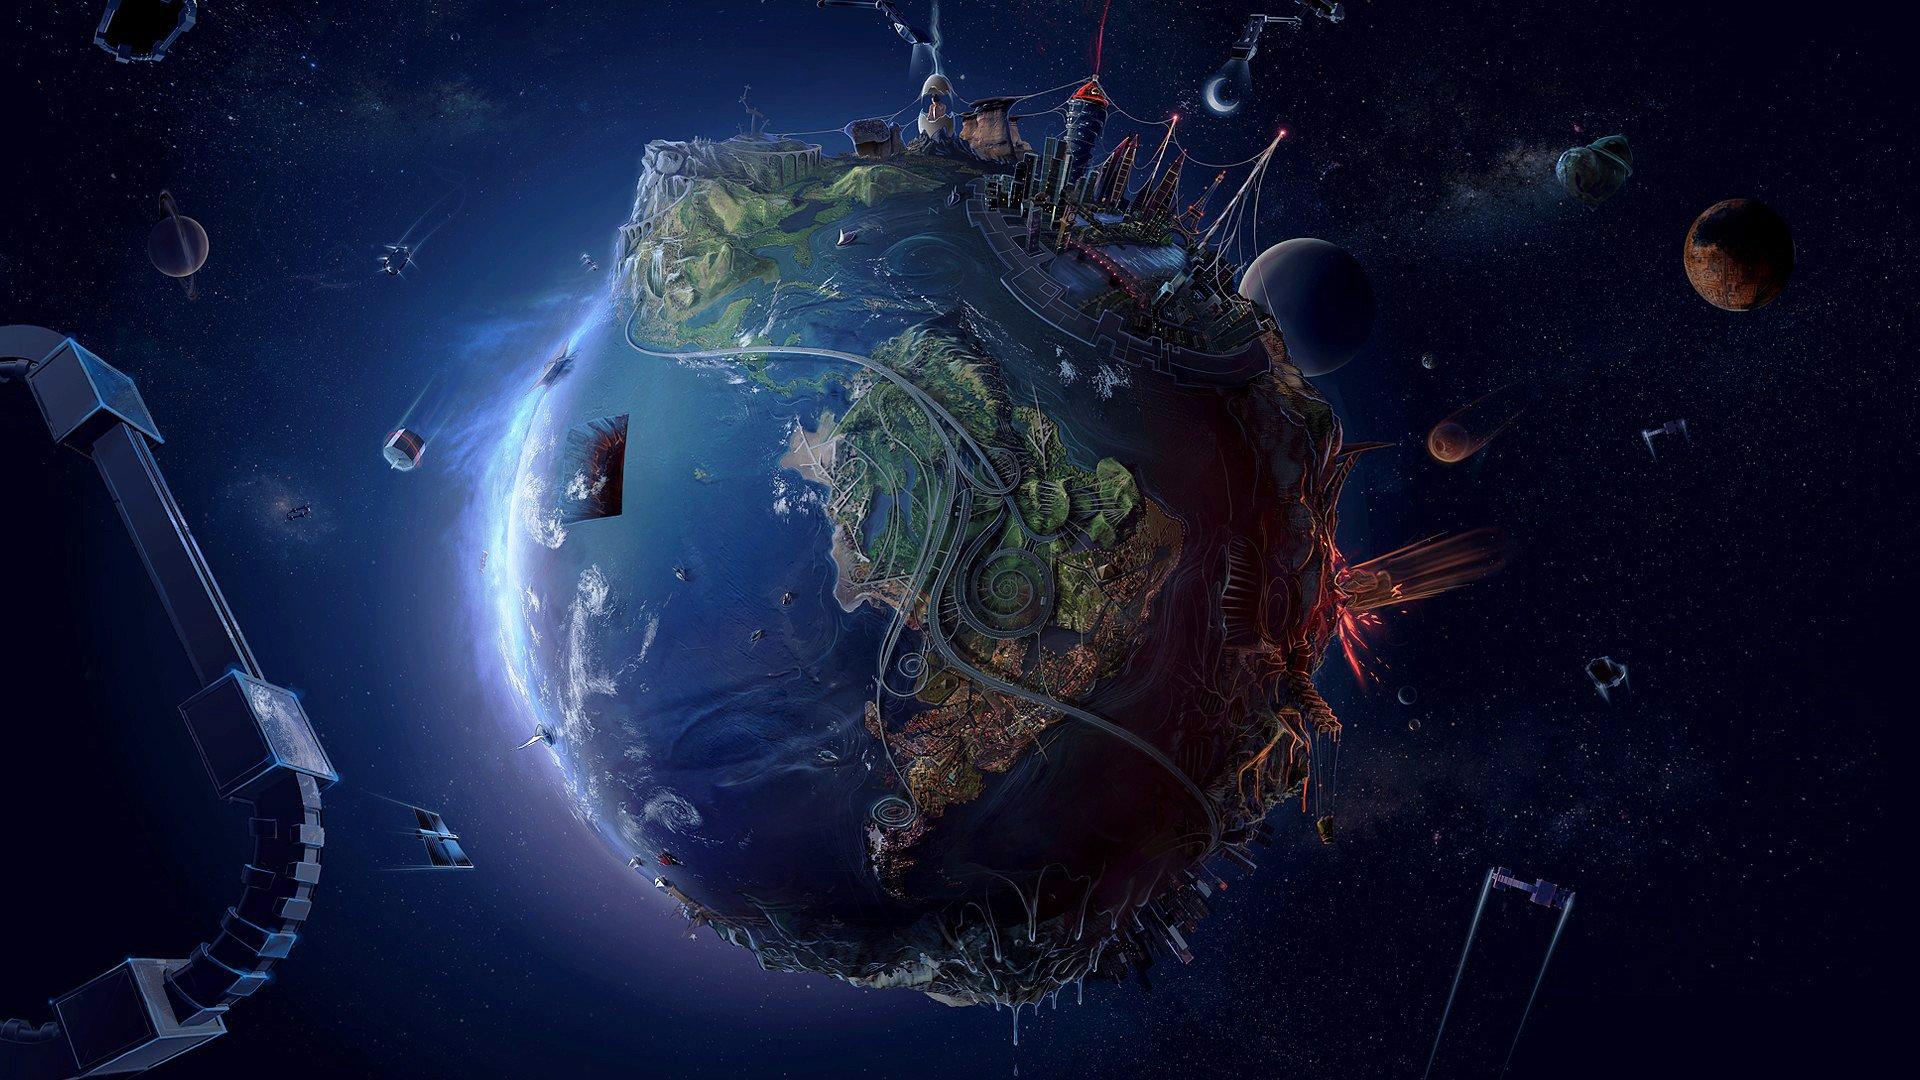 earth wallpaper hd 1080p - photo #16